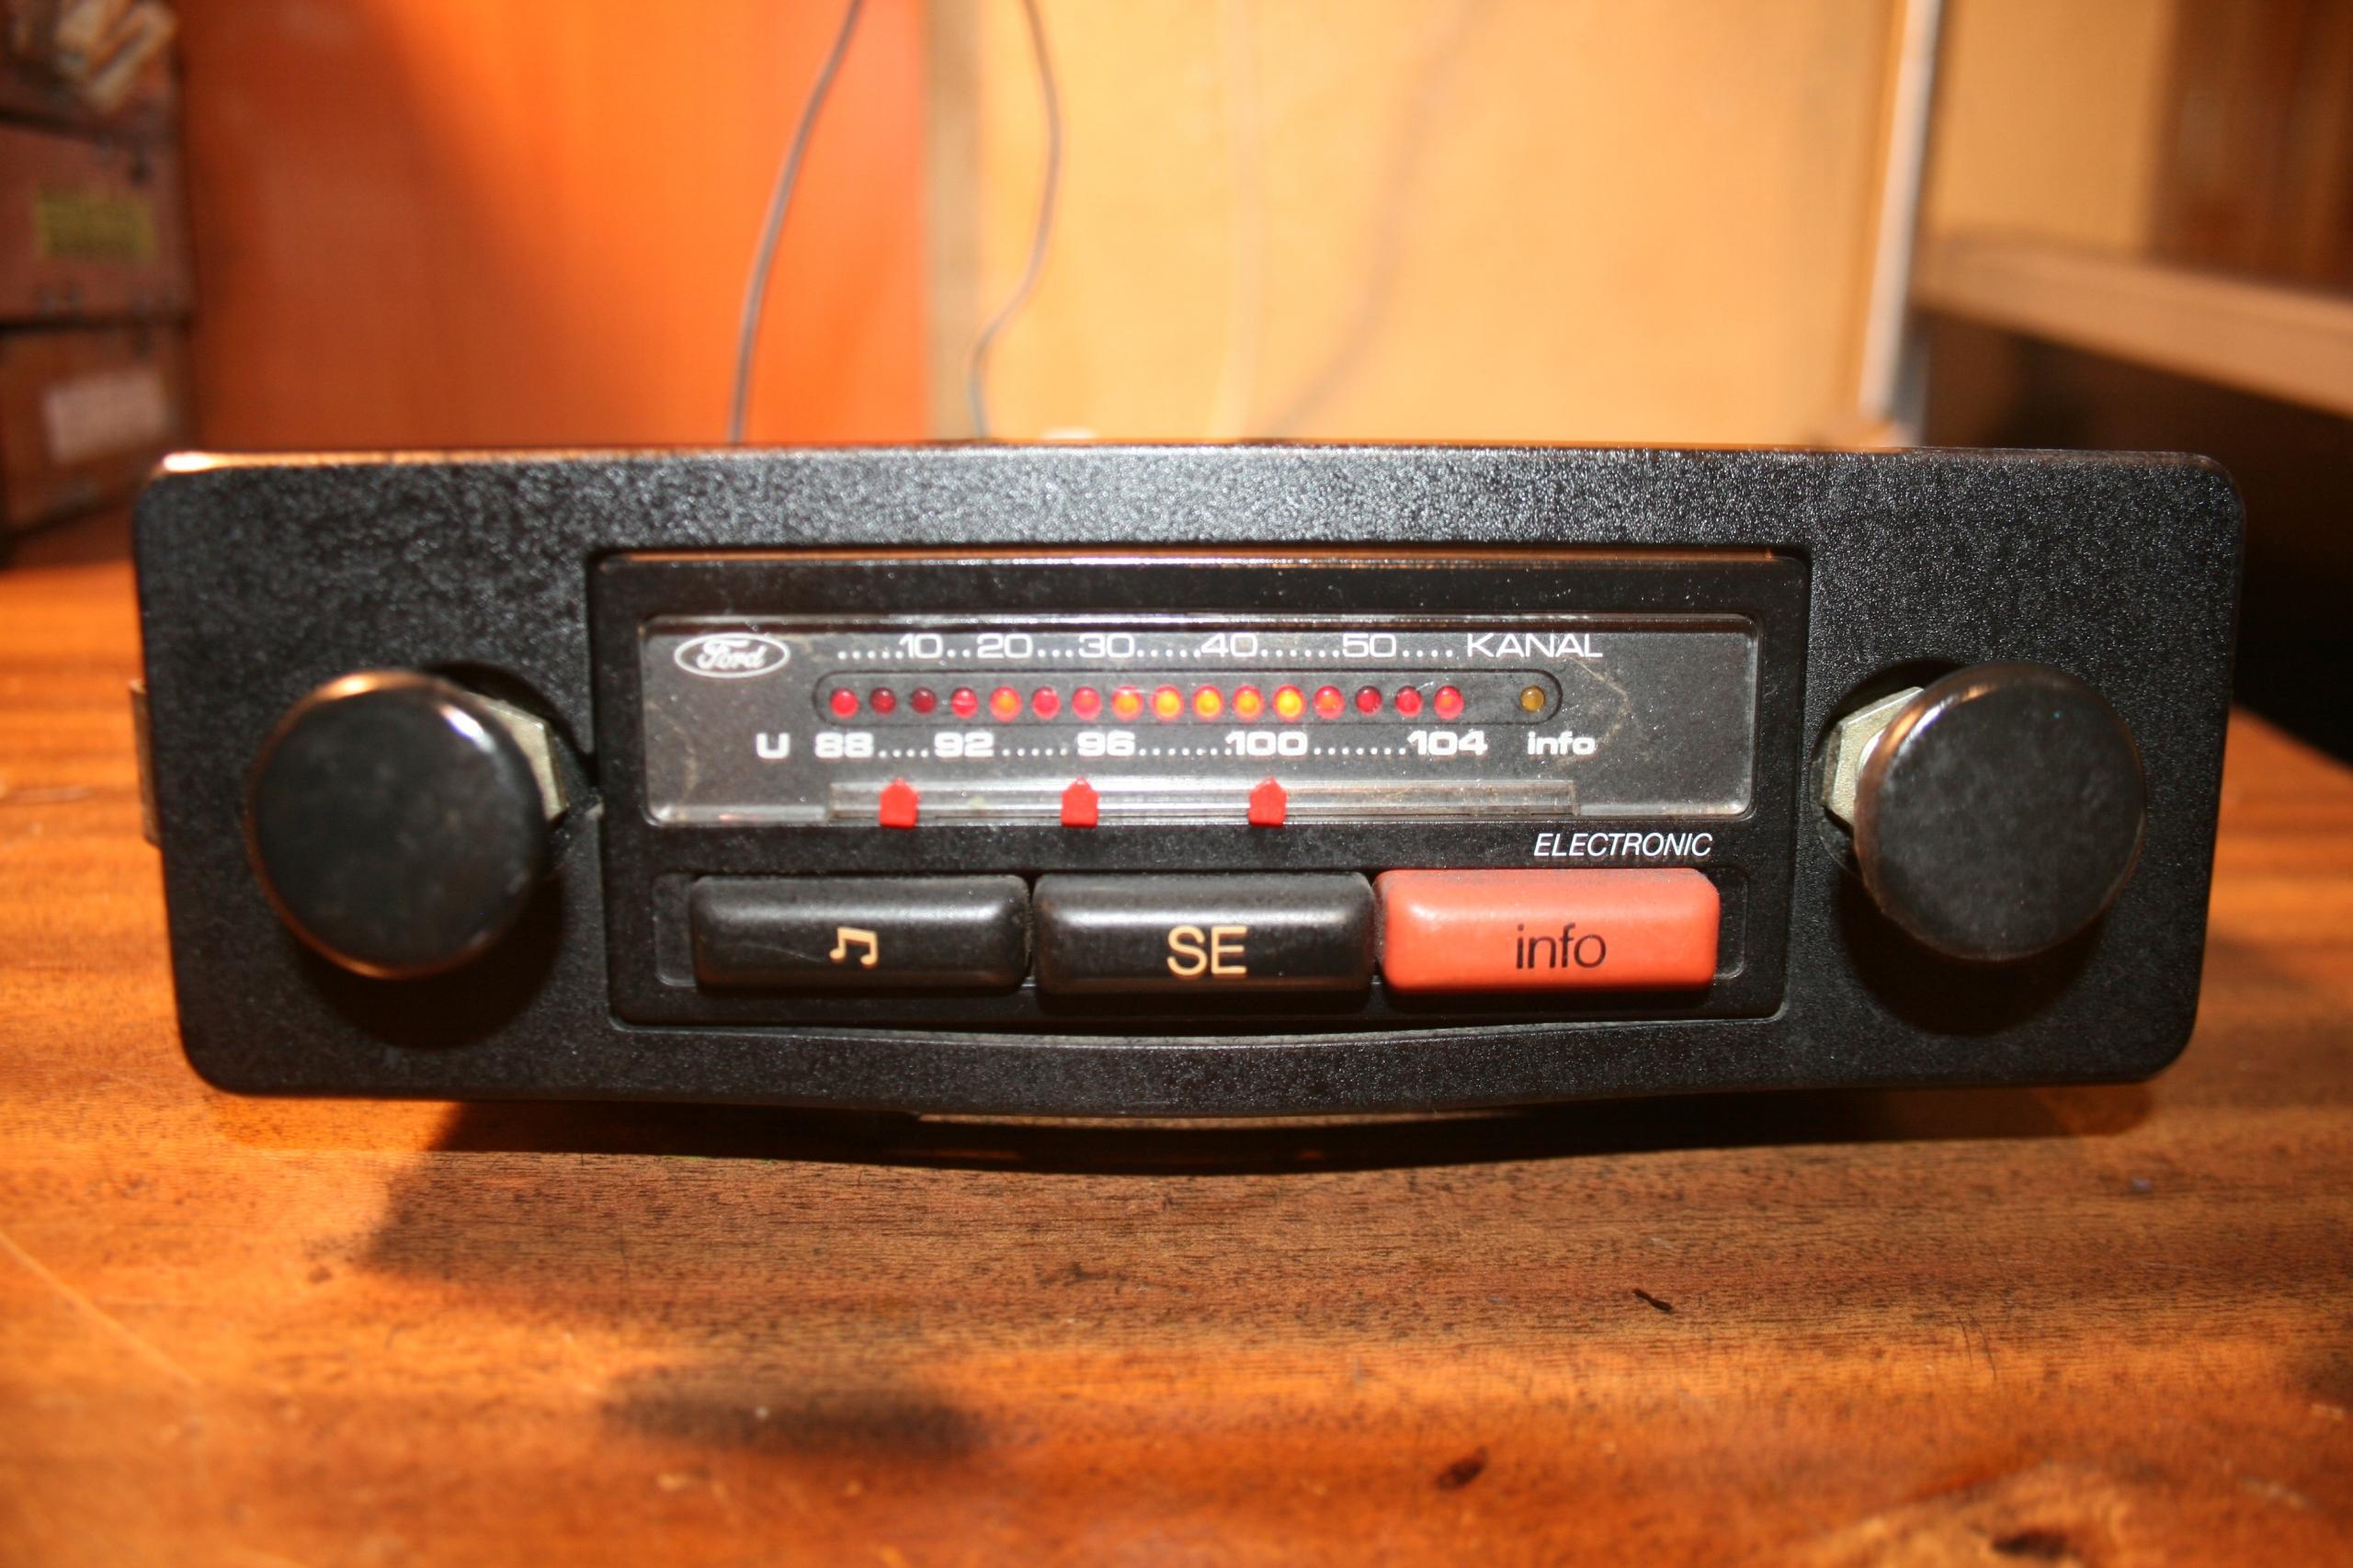 Zabytkowe radio Ford Electronic lata 70-te